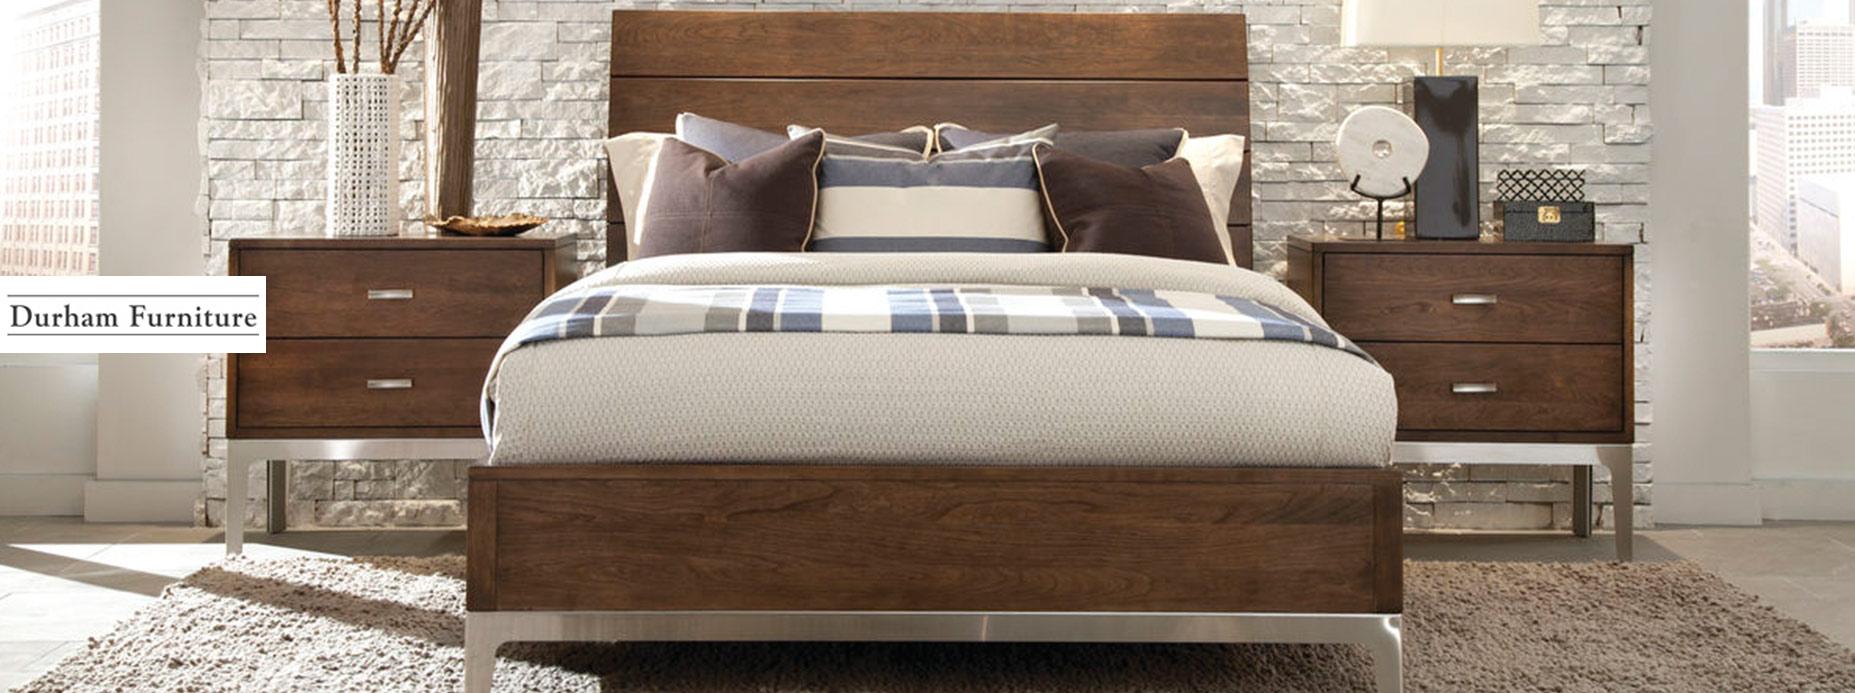 HOME / BRANDS / Durham Furniture